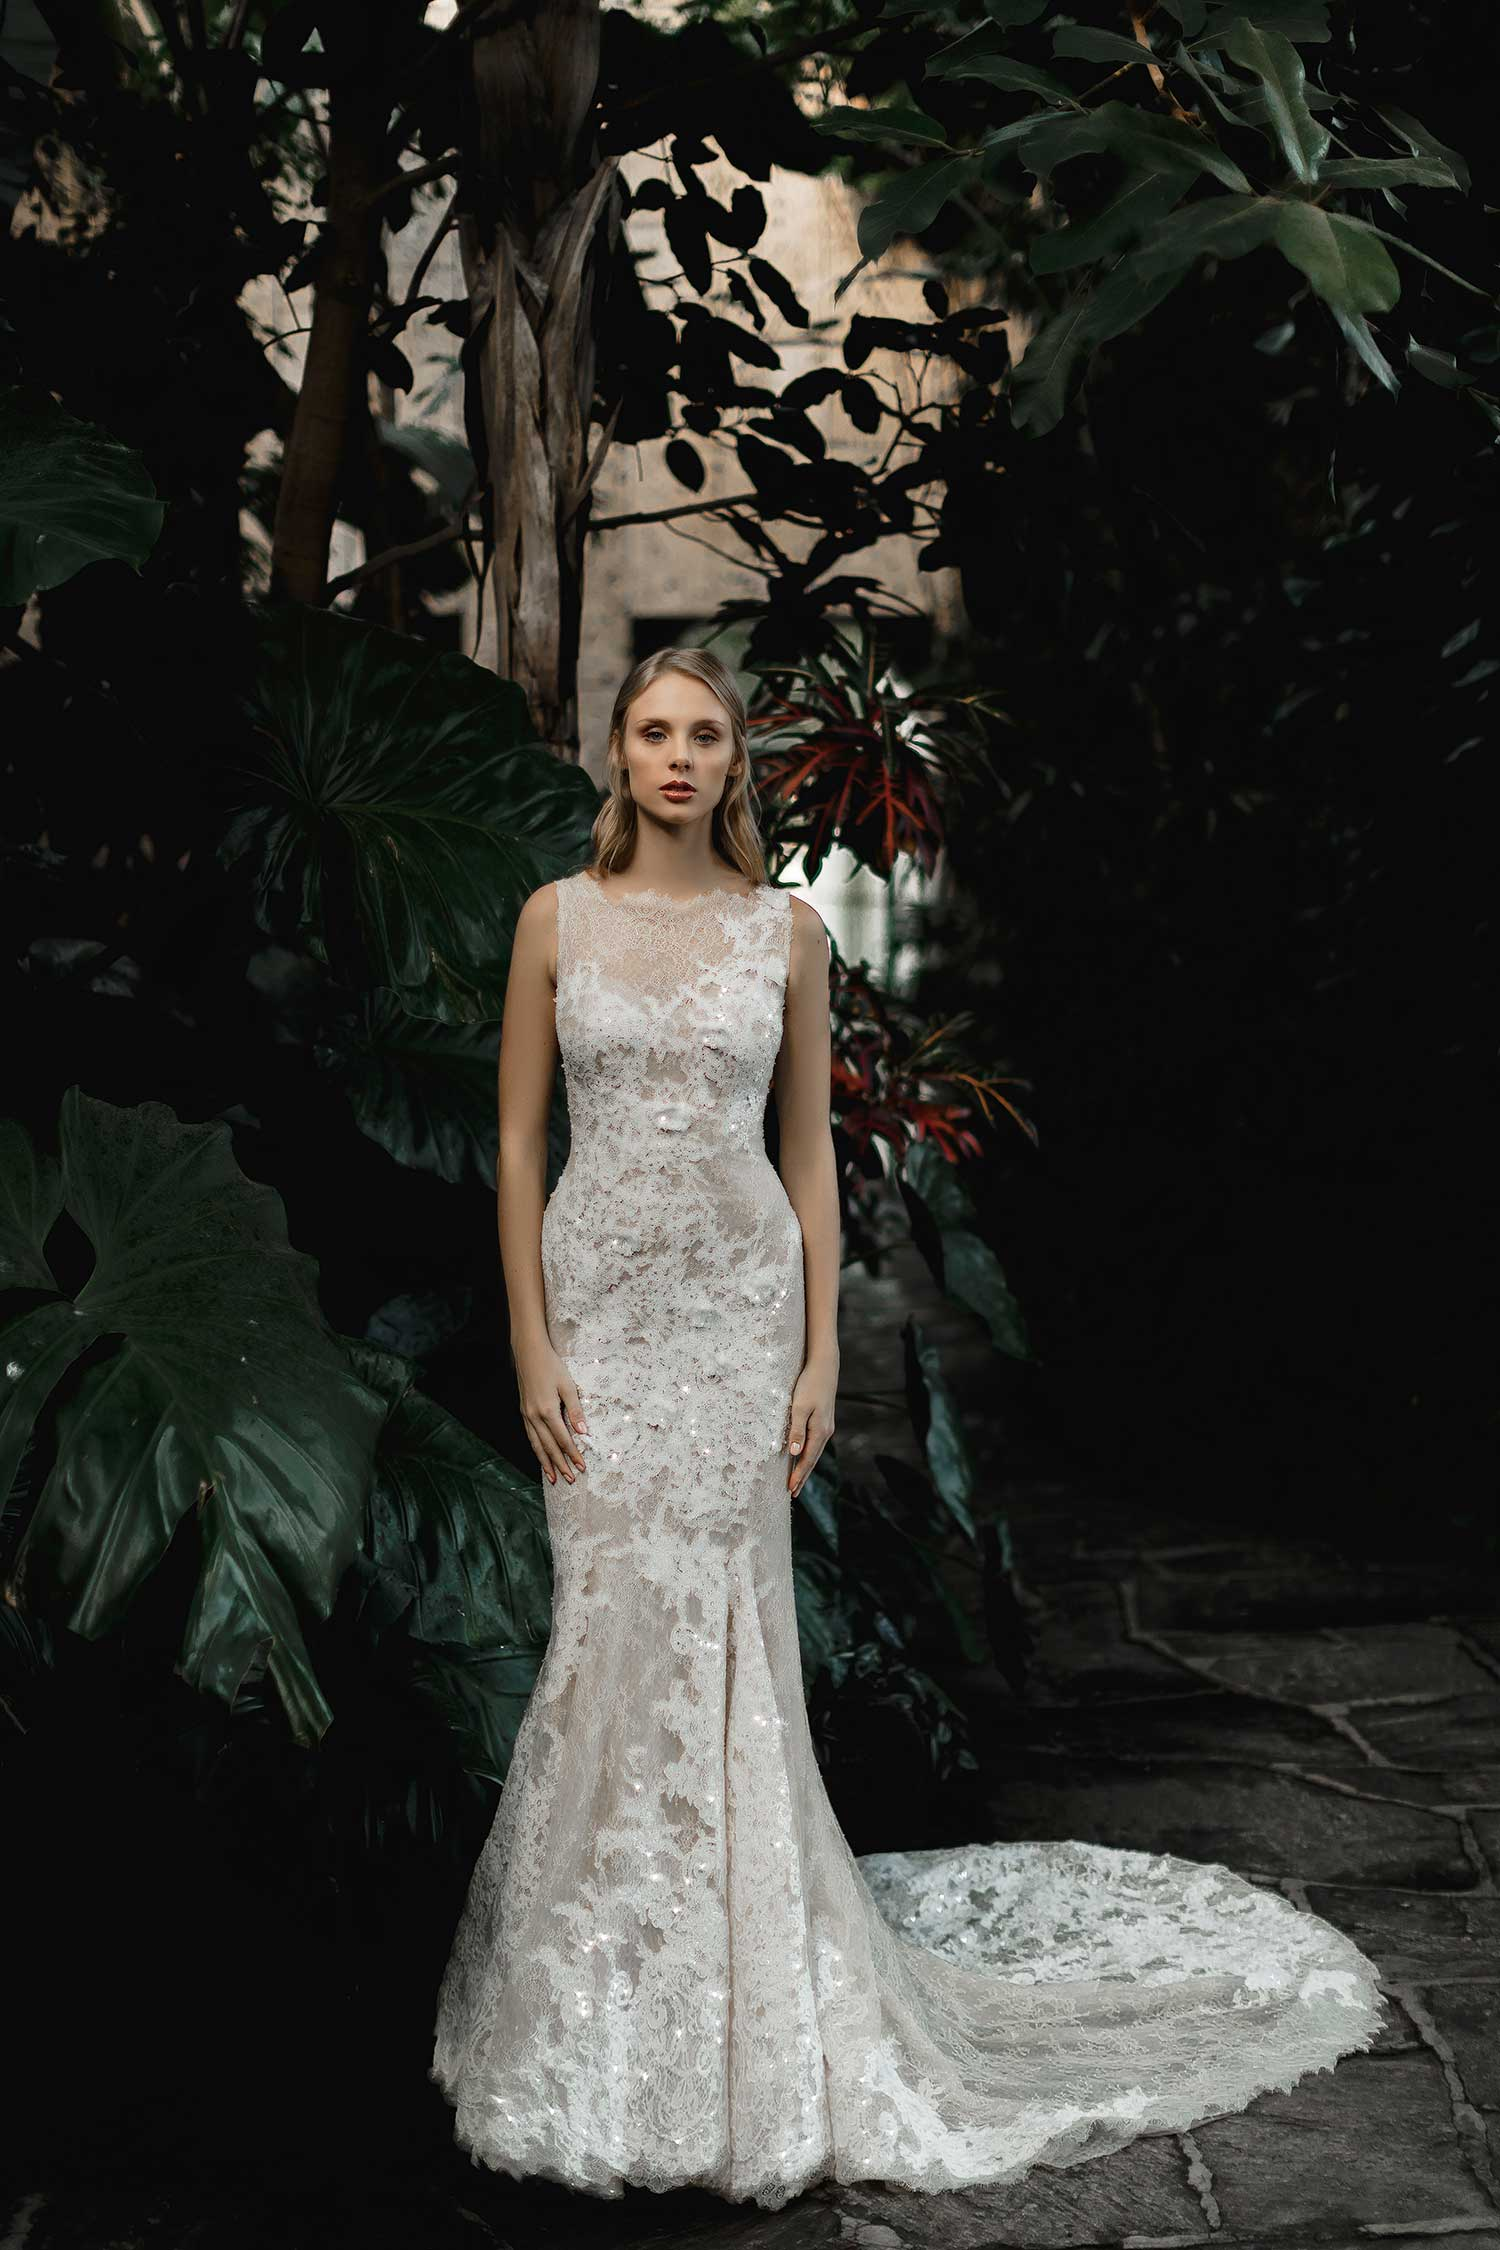 Artistic bridal photos